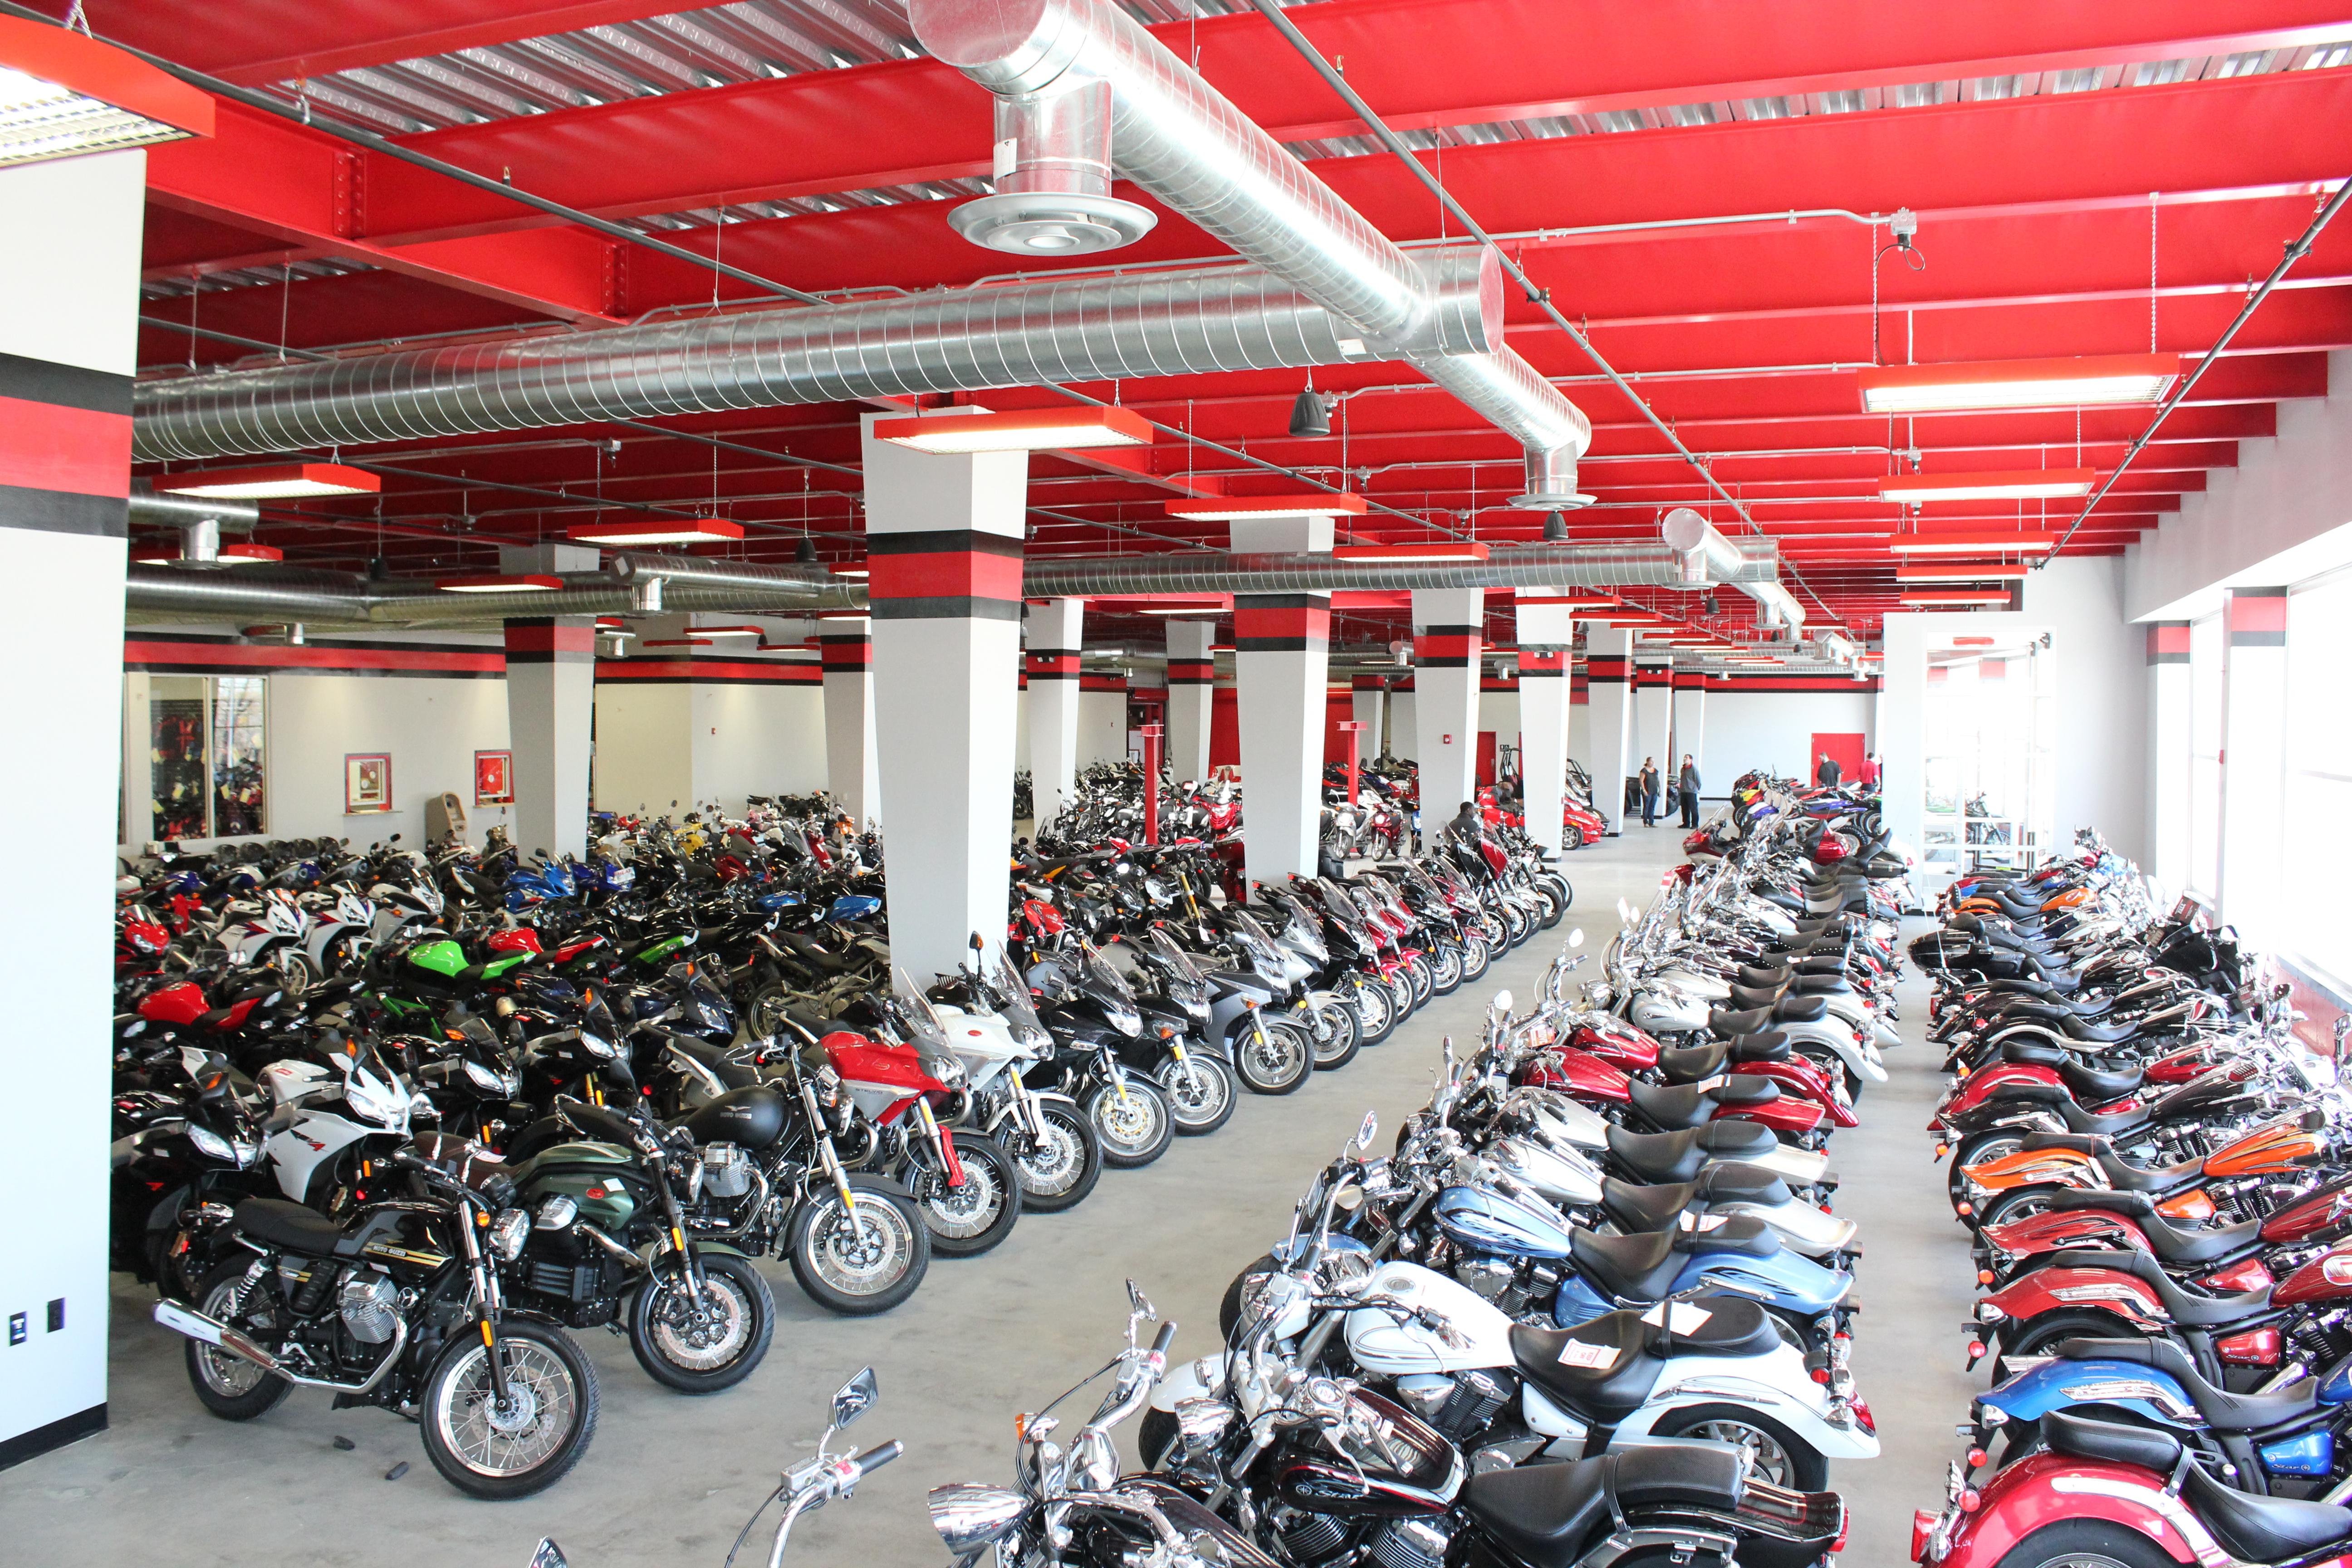 motorcycle belleville mall nj washington ave jersey